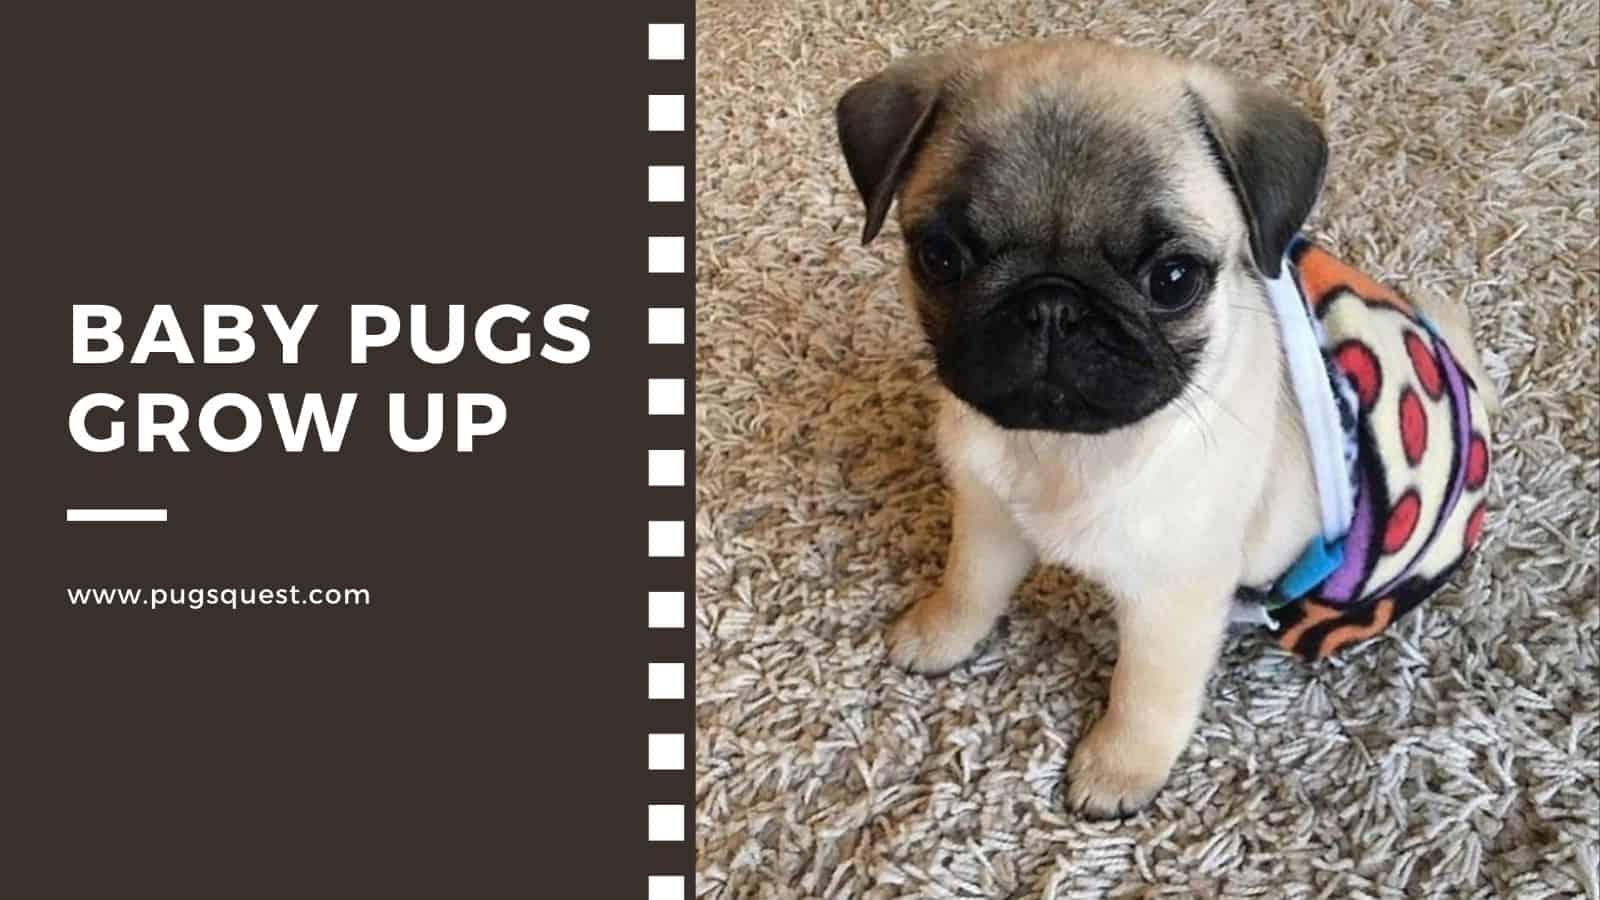 Baby pugs grow up